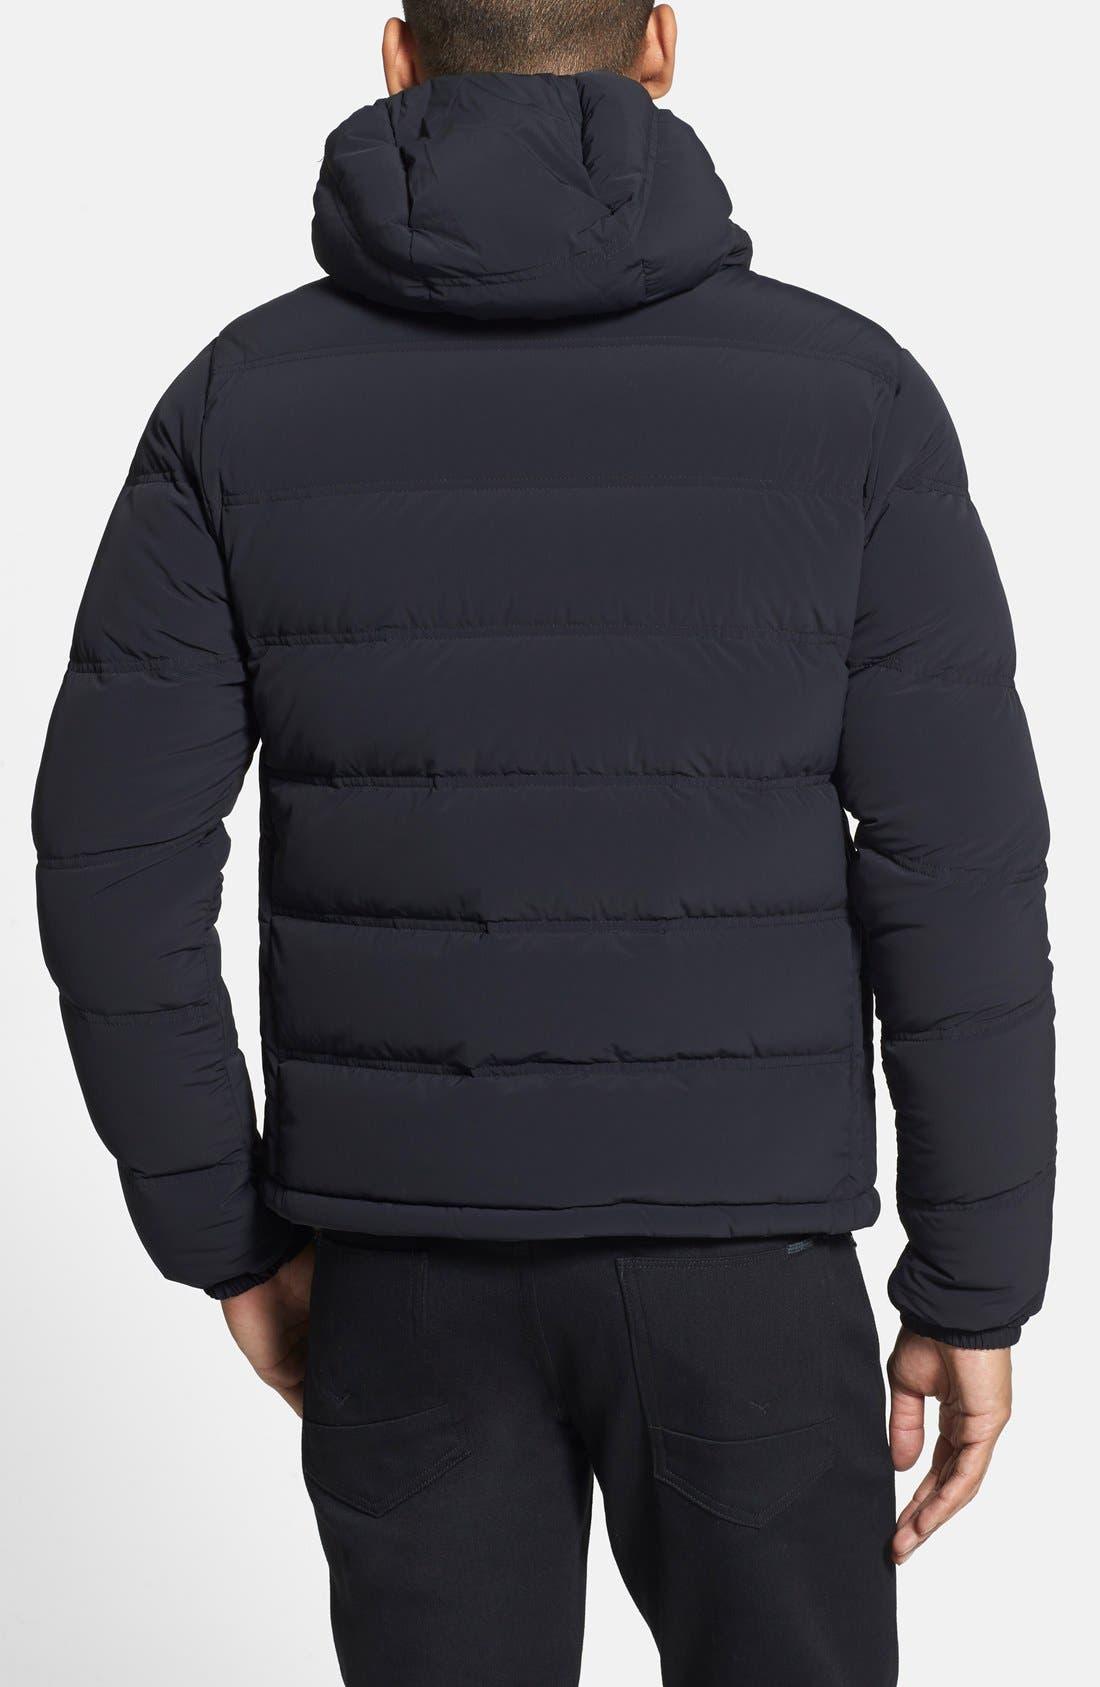 ASPESI,                             'Elastico' Trim Fit Hooded Puffer Jacket,                             Alternate thumbnail 3, color,                             001